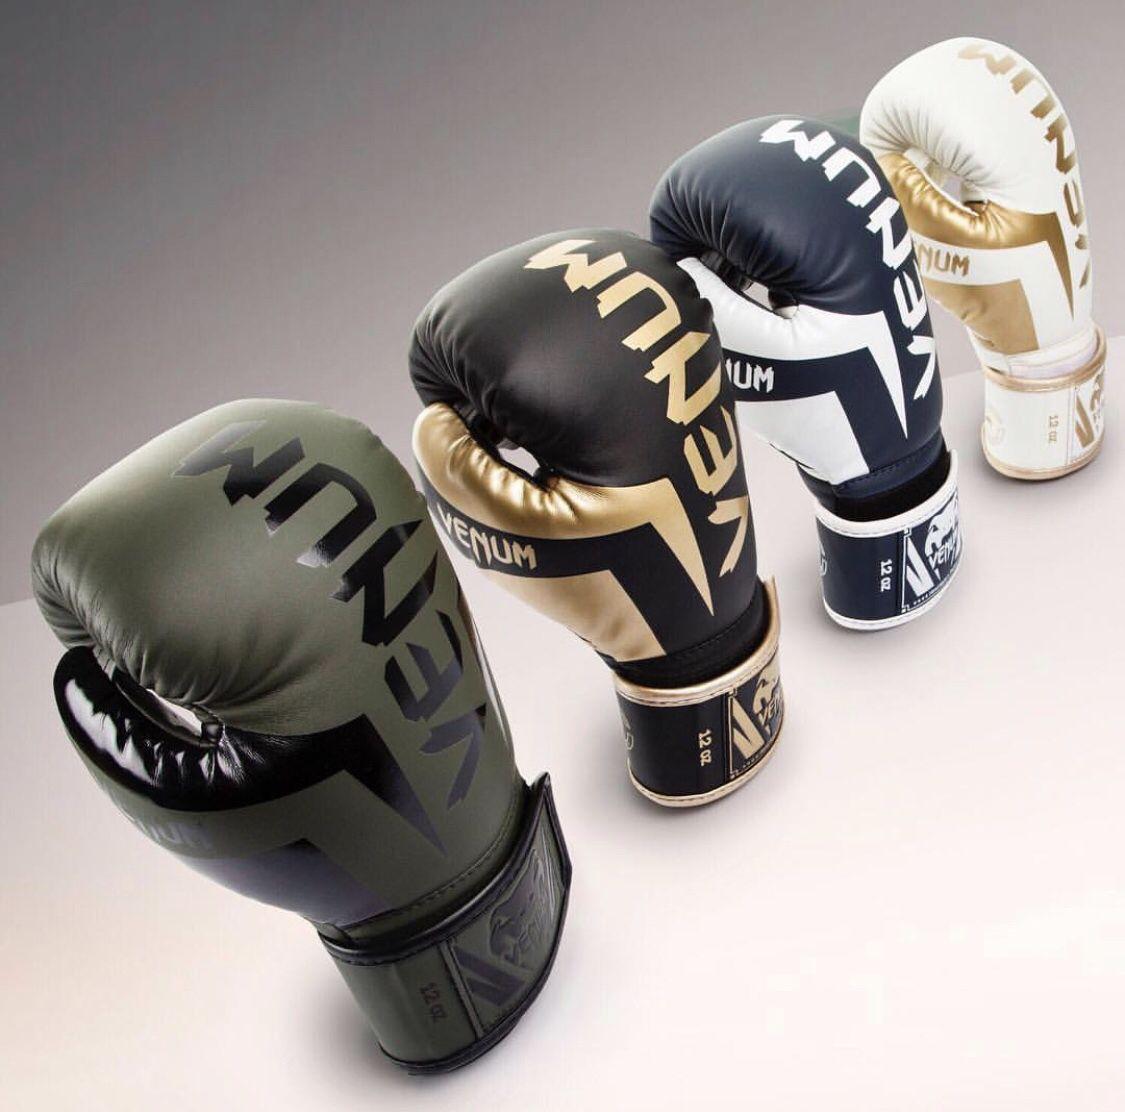 Venum Fight Wear #boxing #boxinggloves #mma #mma #training